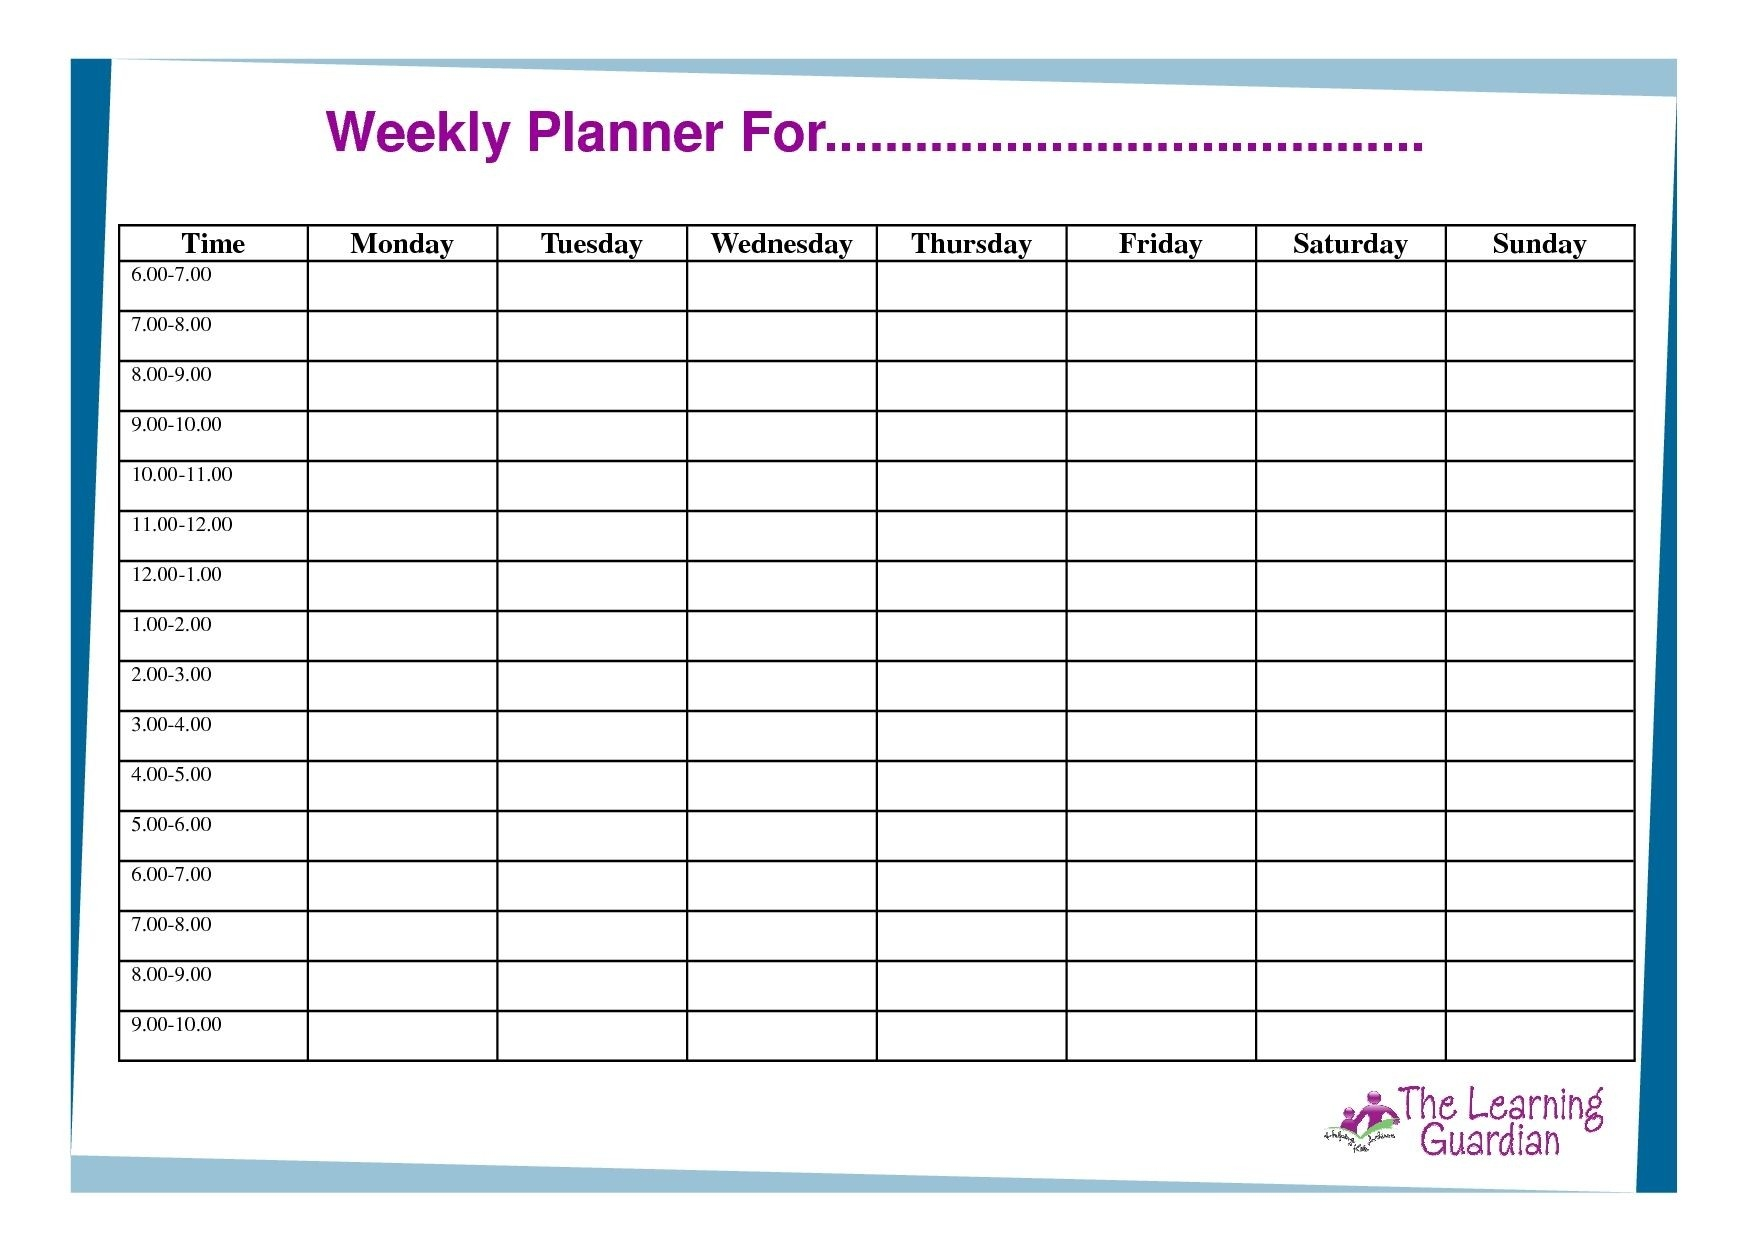 Free Printable Weekly Calendar Templates Planner For Time  7 Day Week Planner Printable